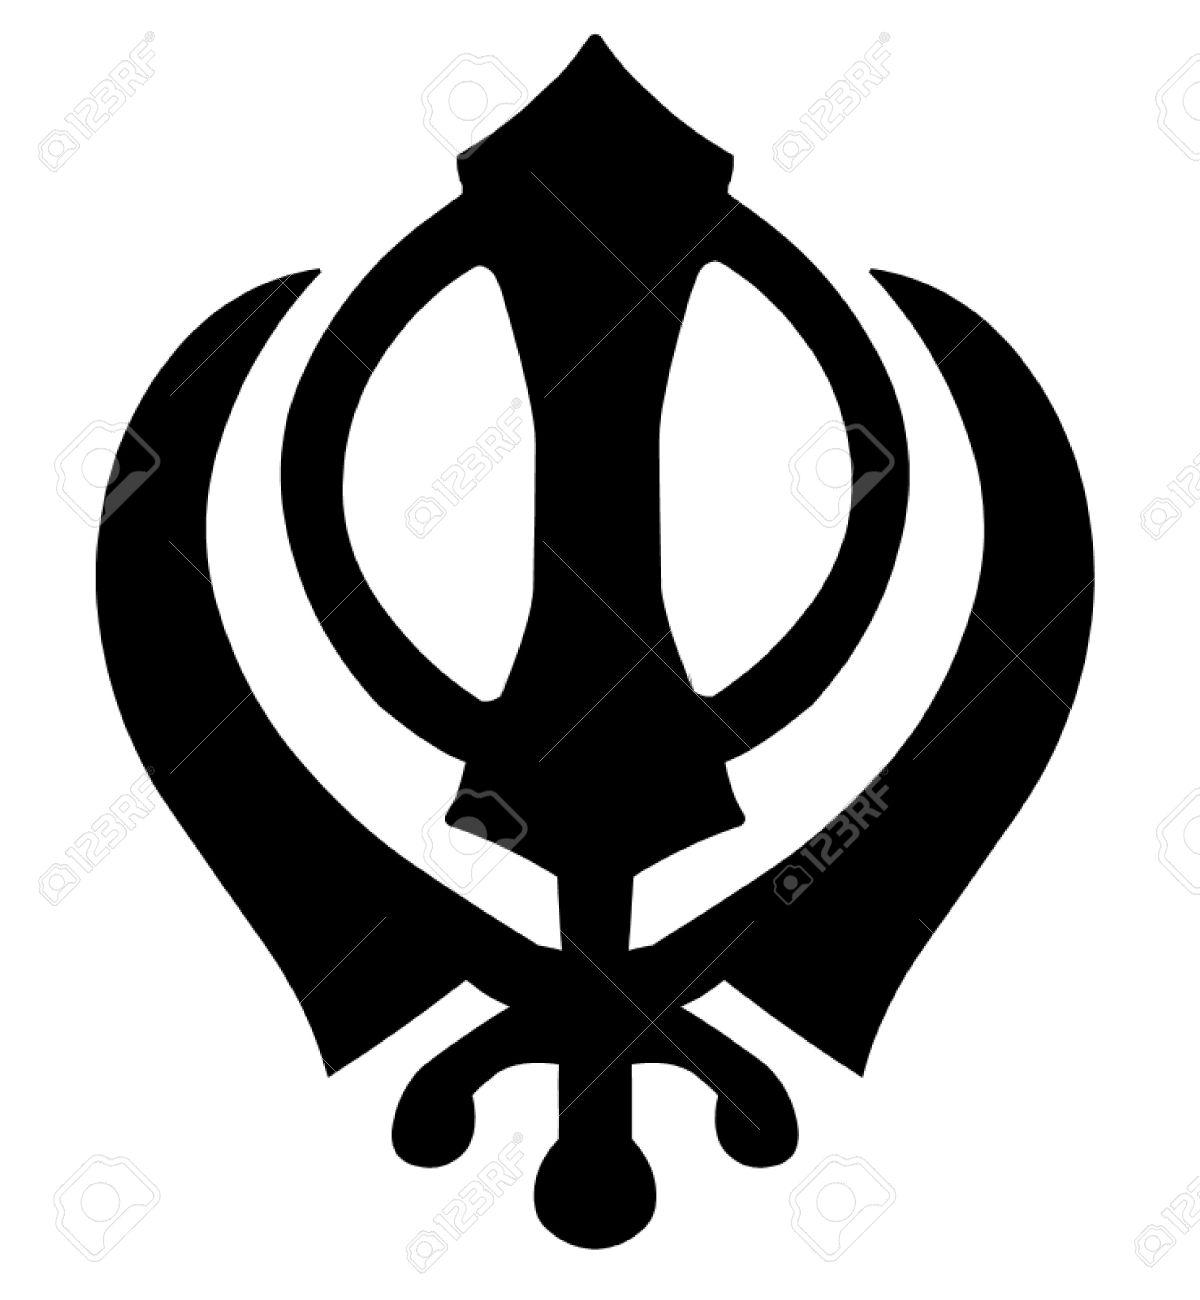 Khanda Sikh Symbol Stock Vector - 50149391